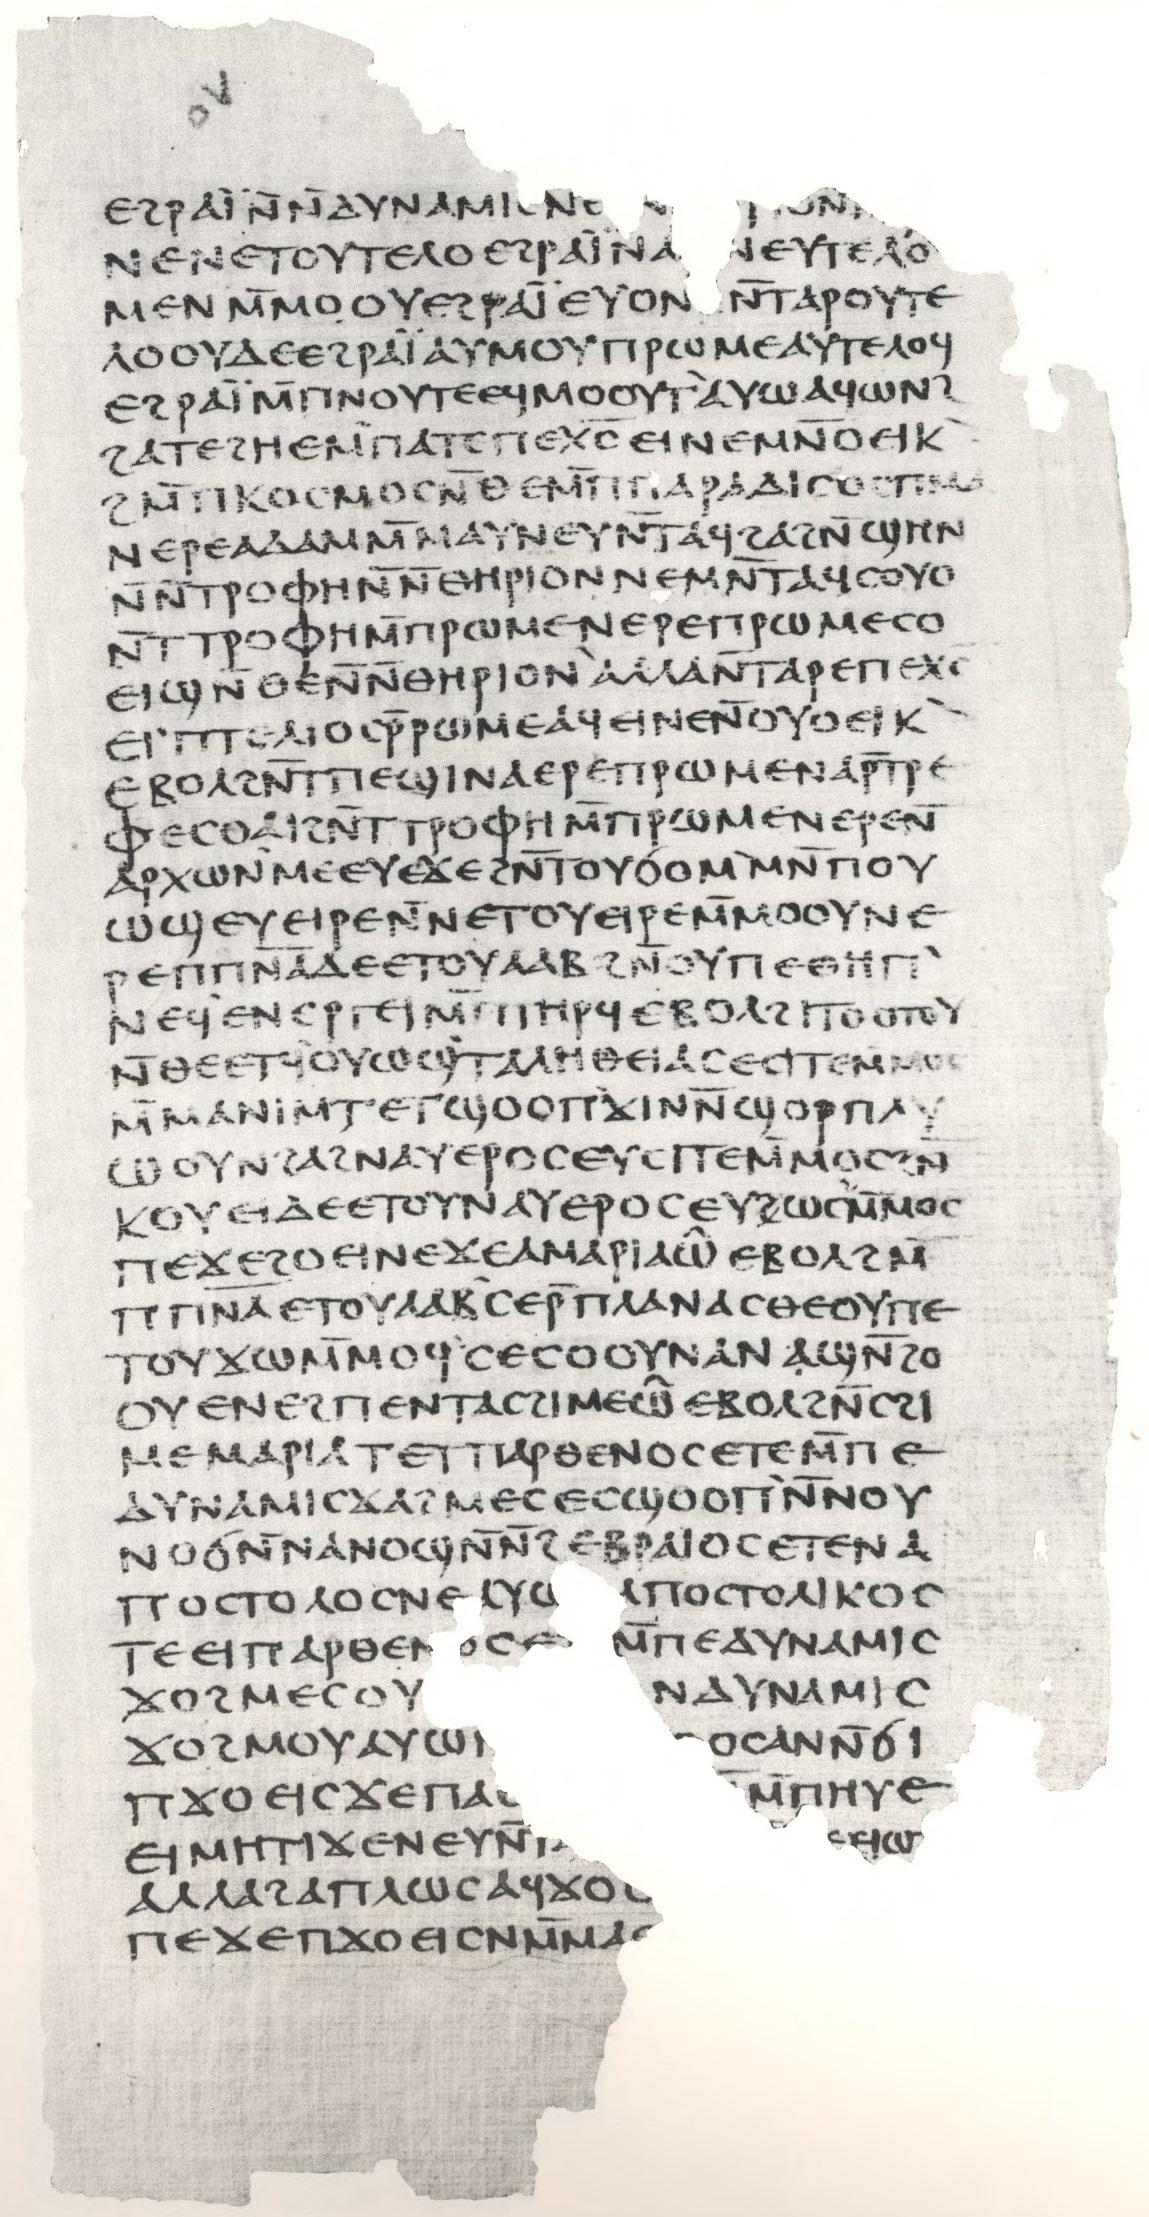 Gospel_of_Philip_facsimile_Page_55.jpg